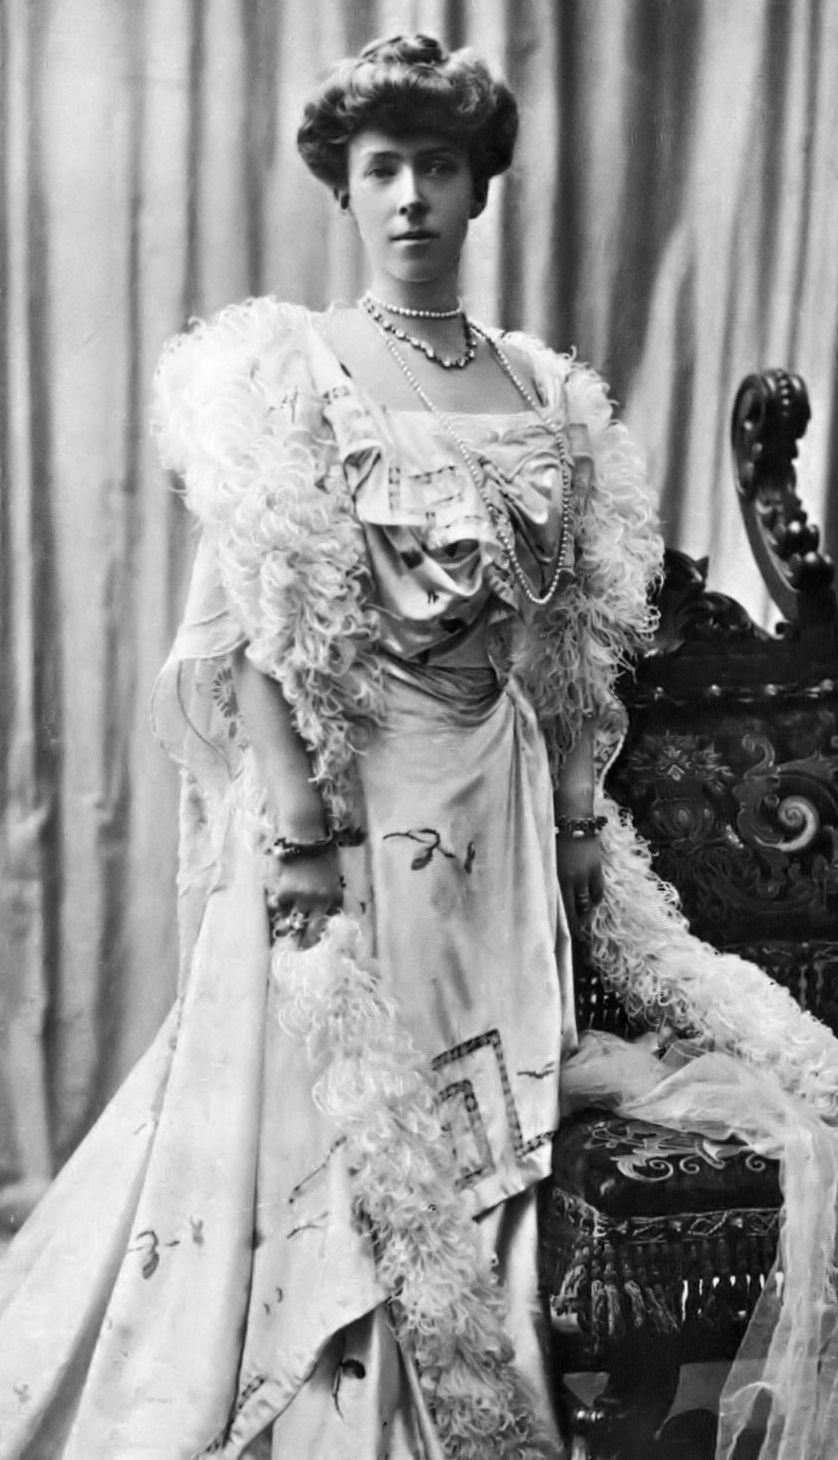 Image of Elisabeth of Bavaria, Queen of Belgium from Wikidata